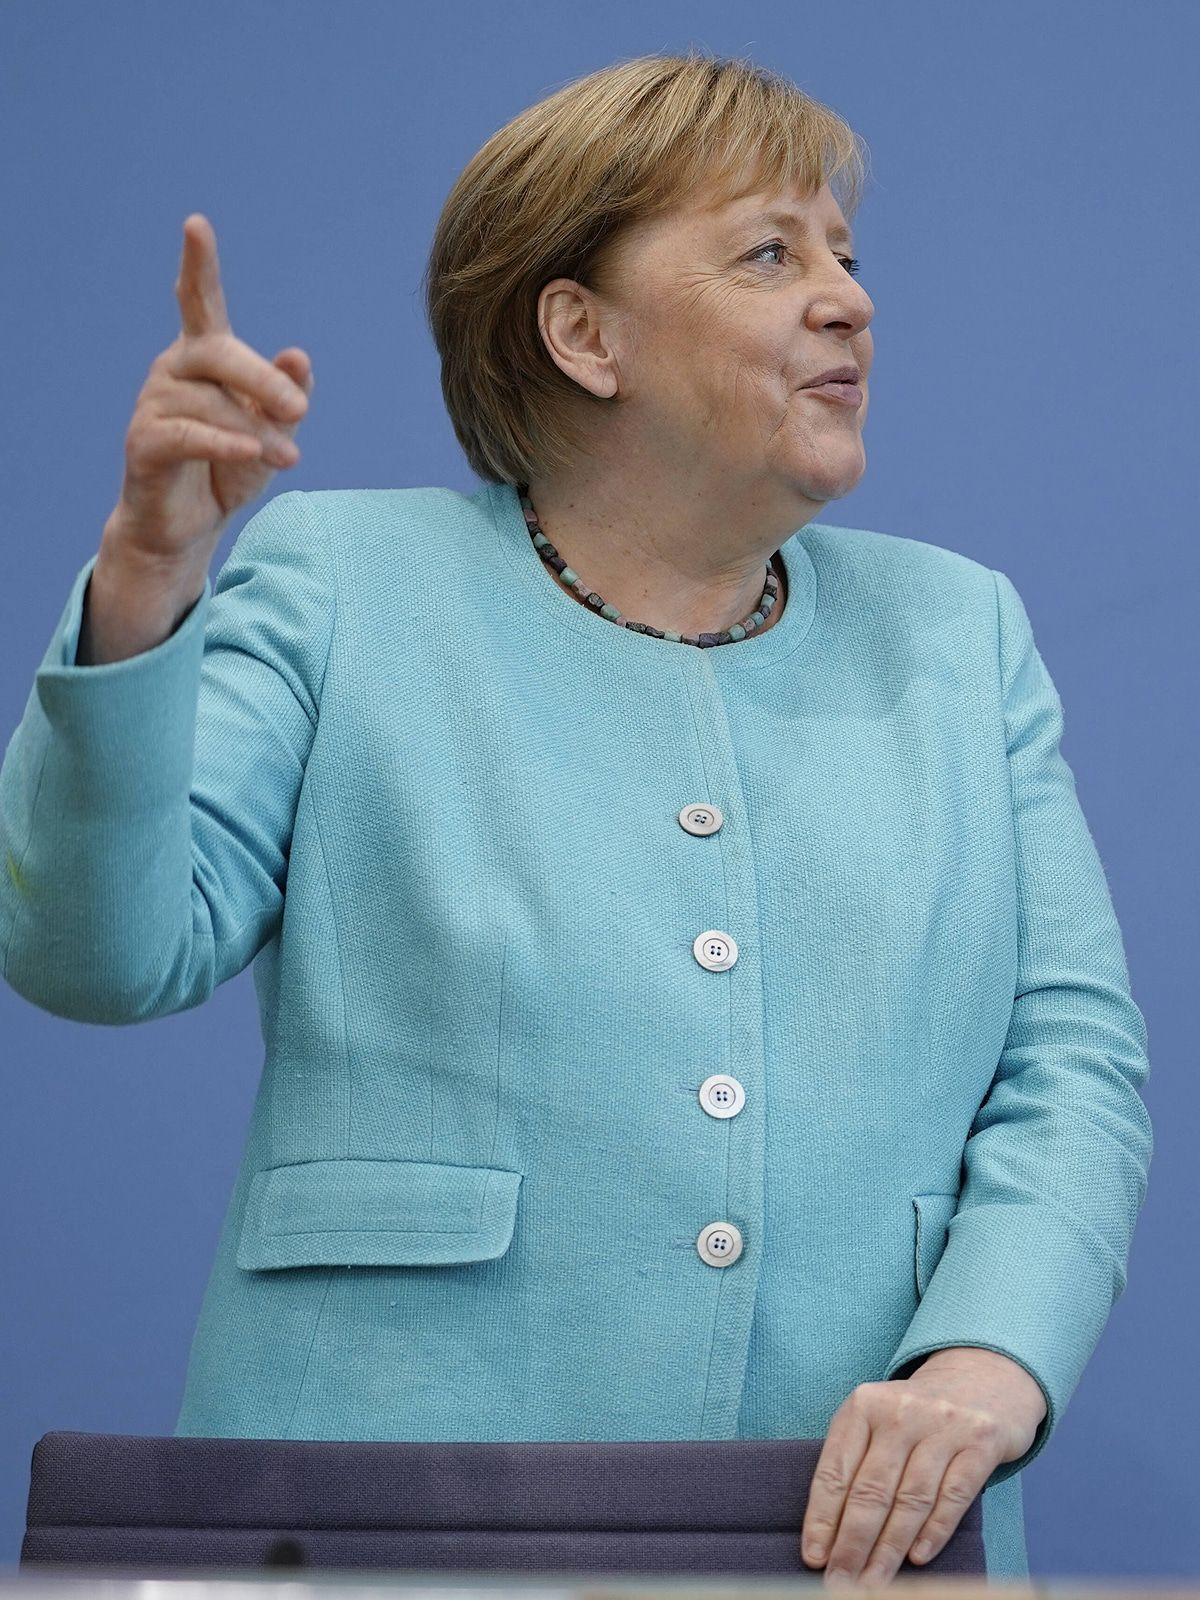 Das sagt Giorgio Armani über Angela Merkels Klamottenstil